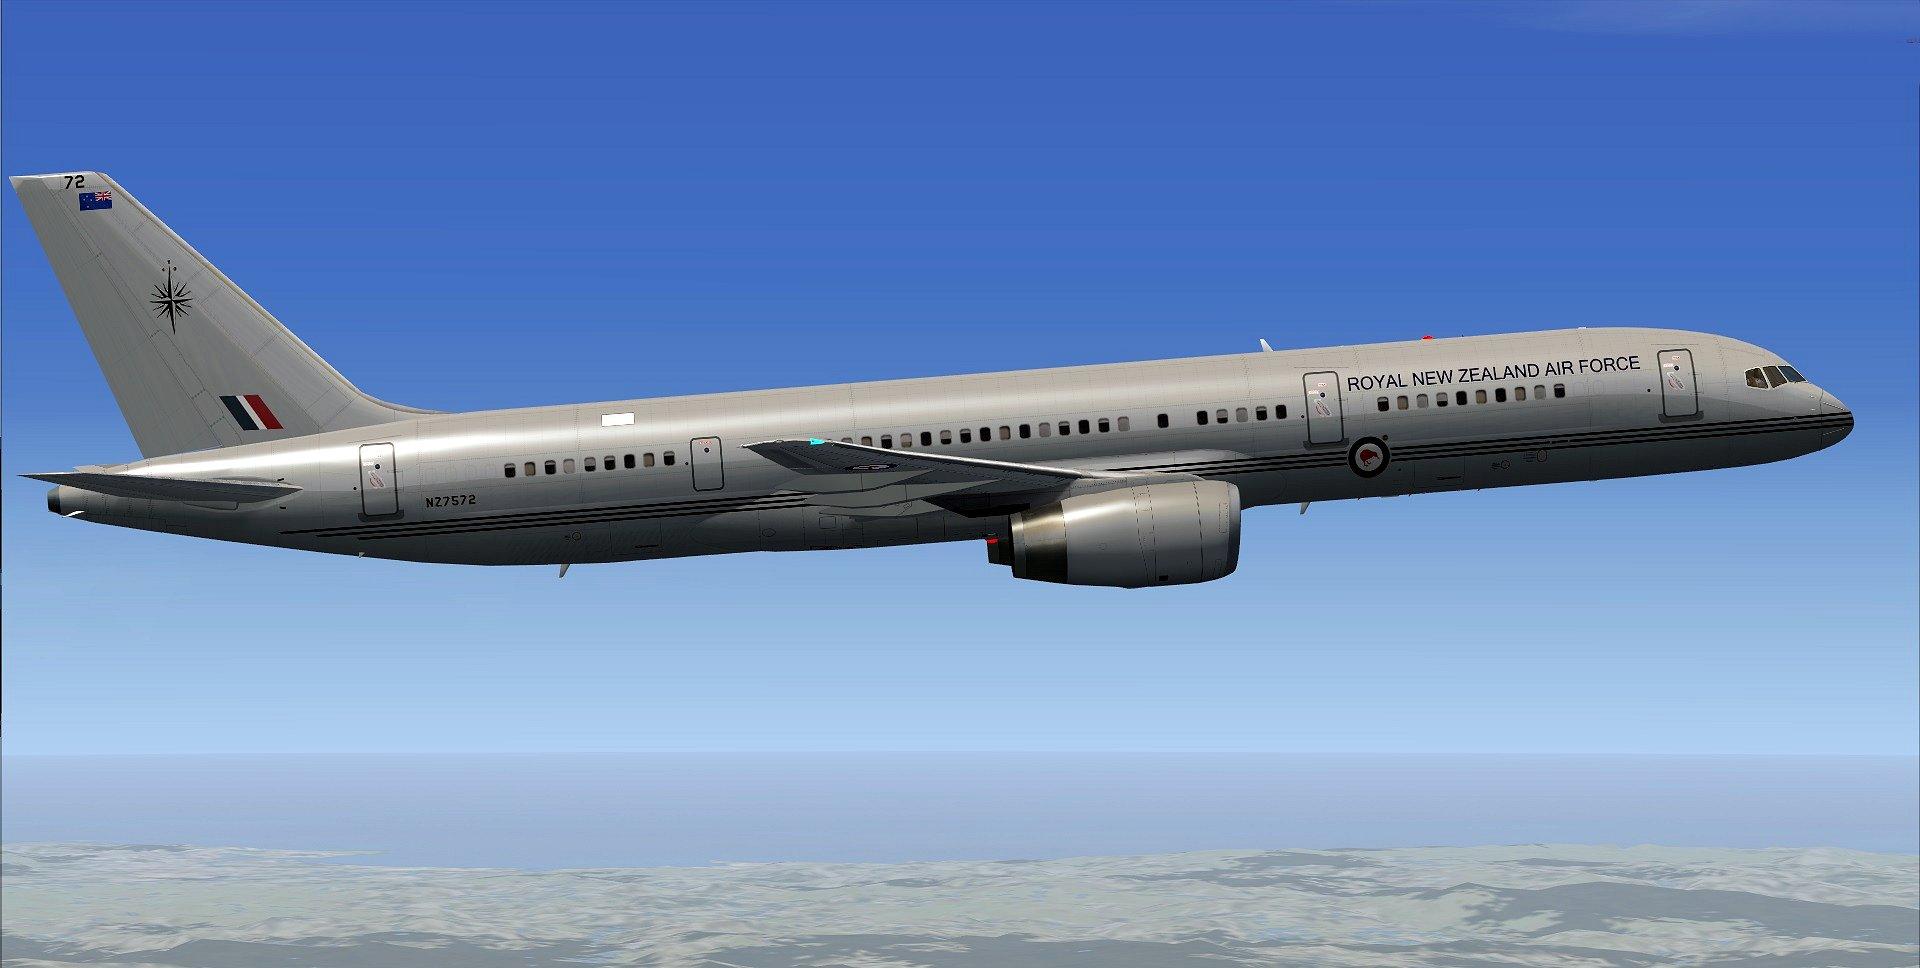 RNZAF 757-200M In Action